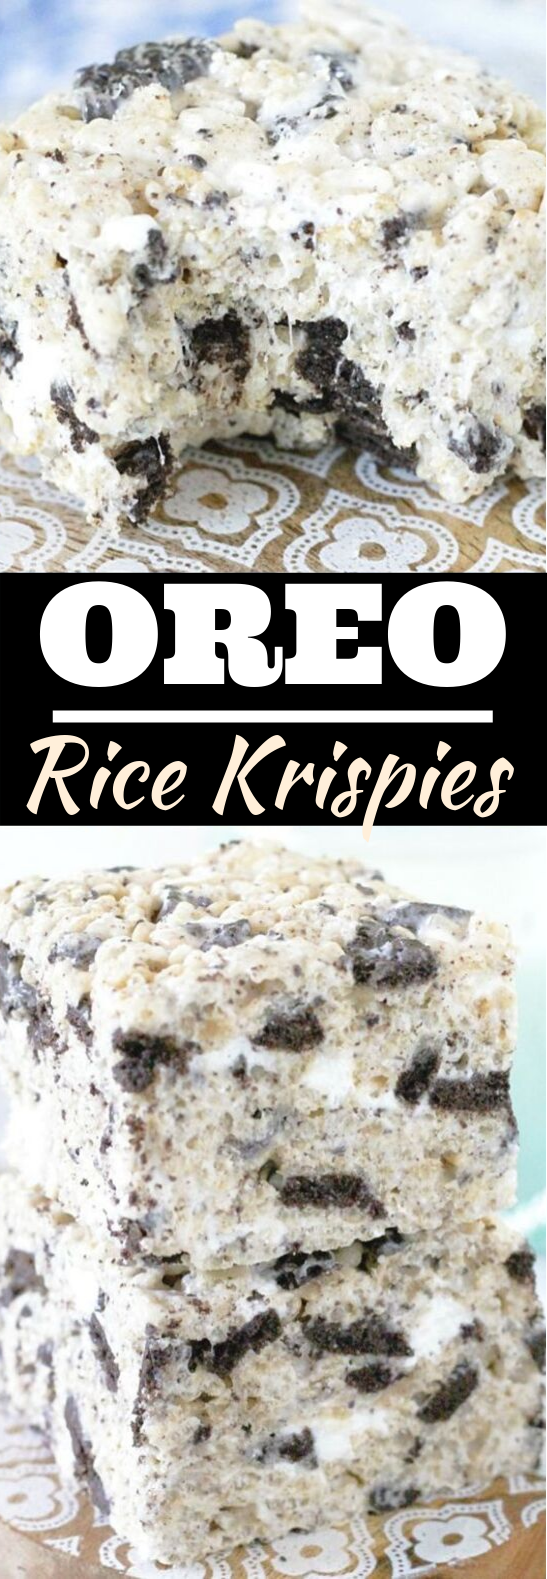 Oreo Krispies #desserts #oreo